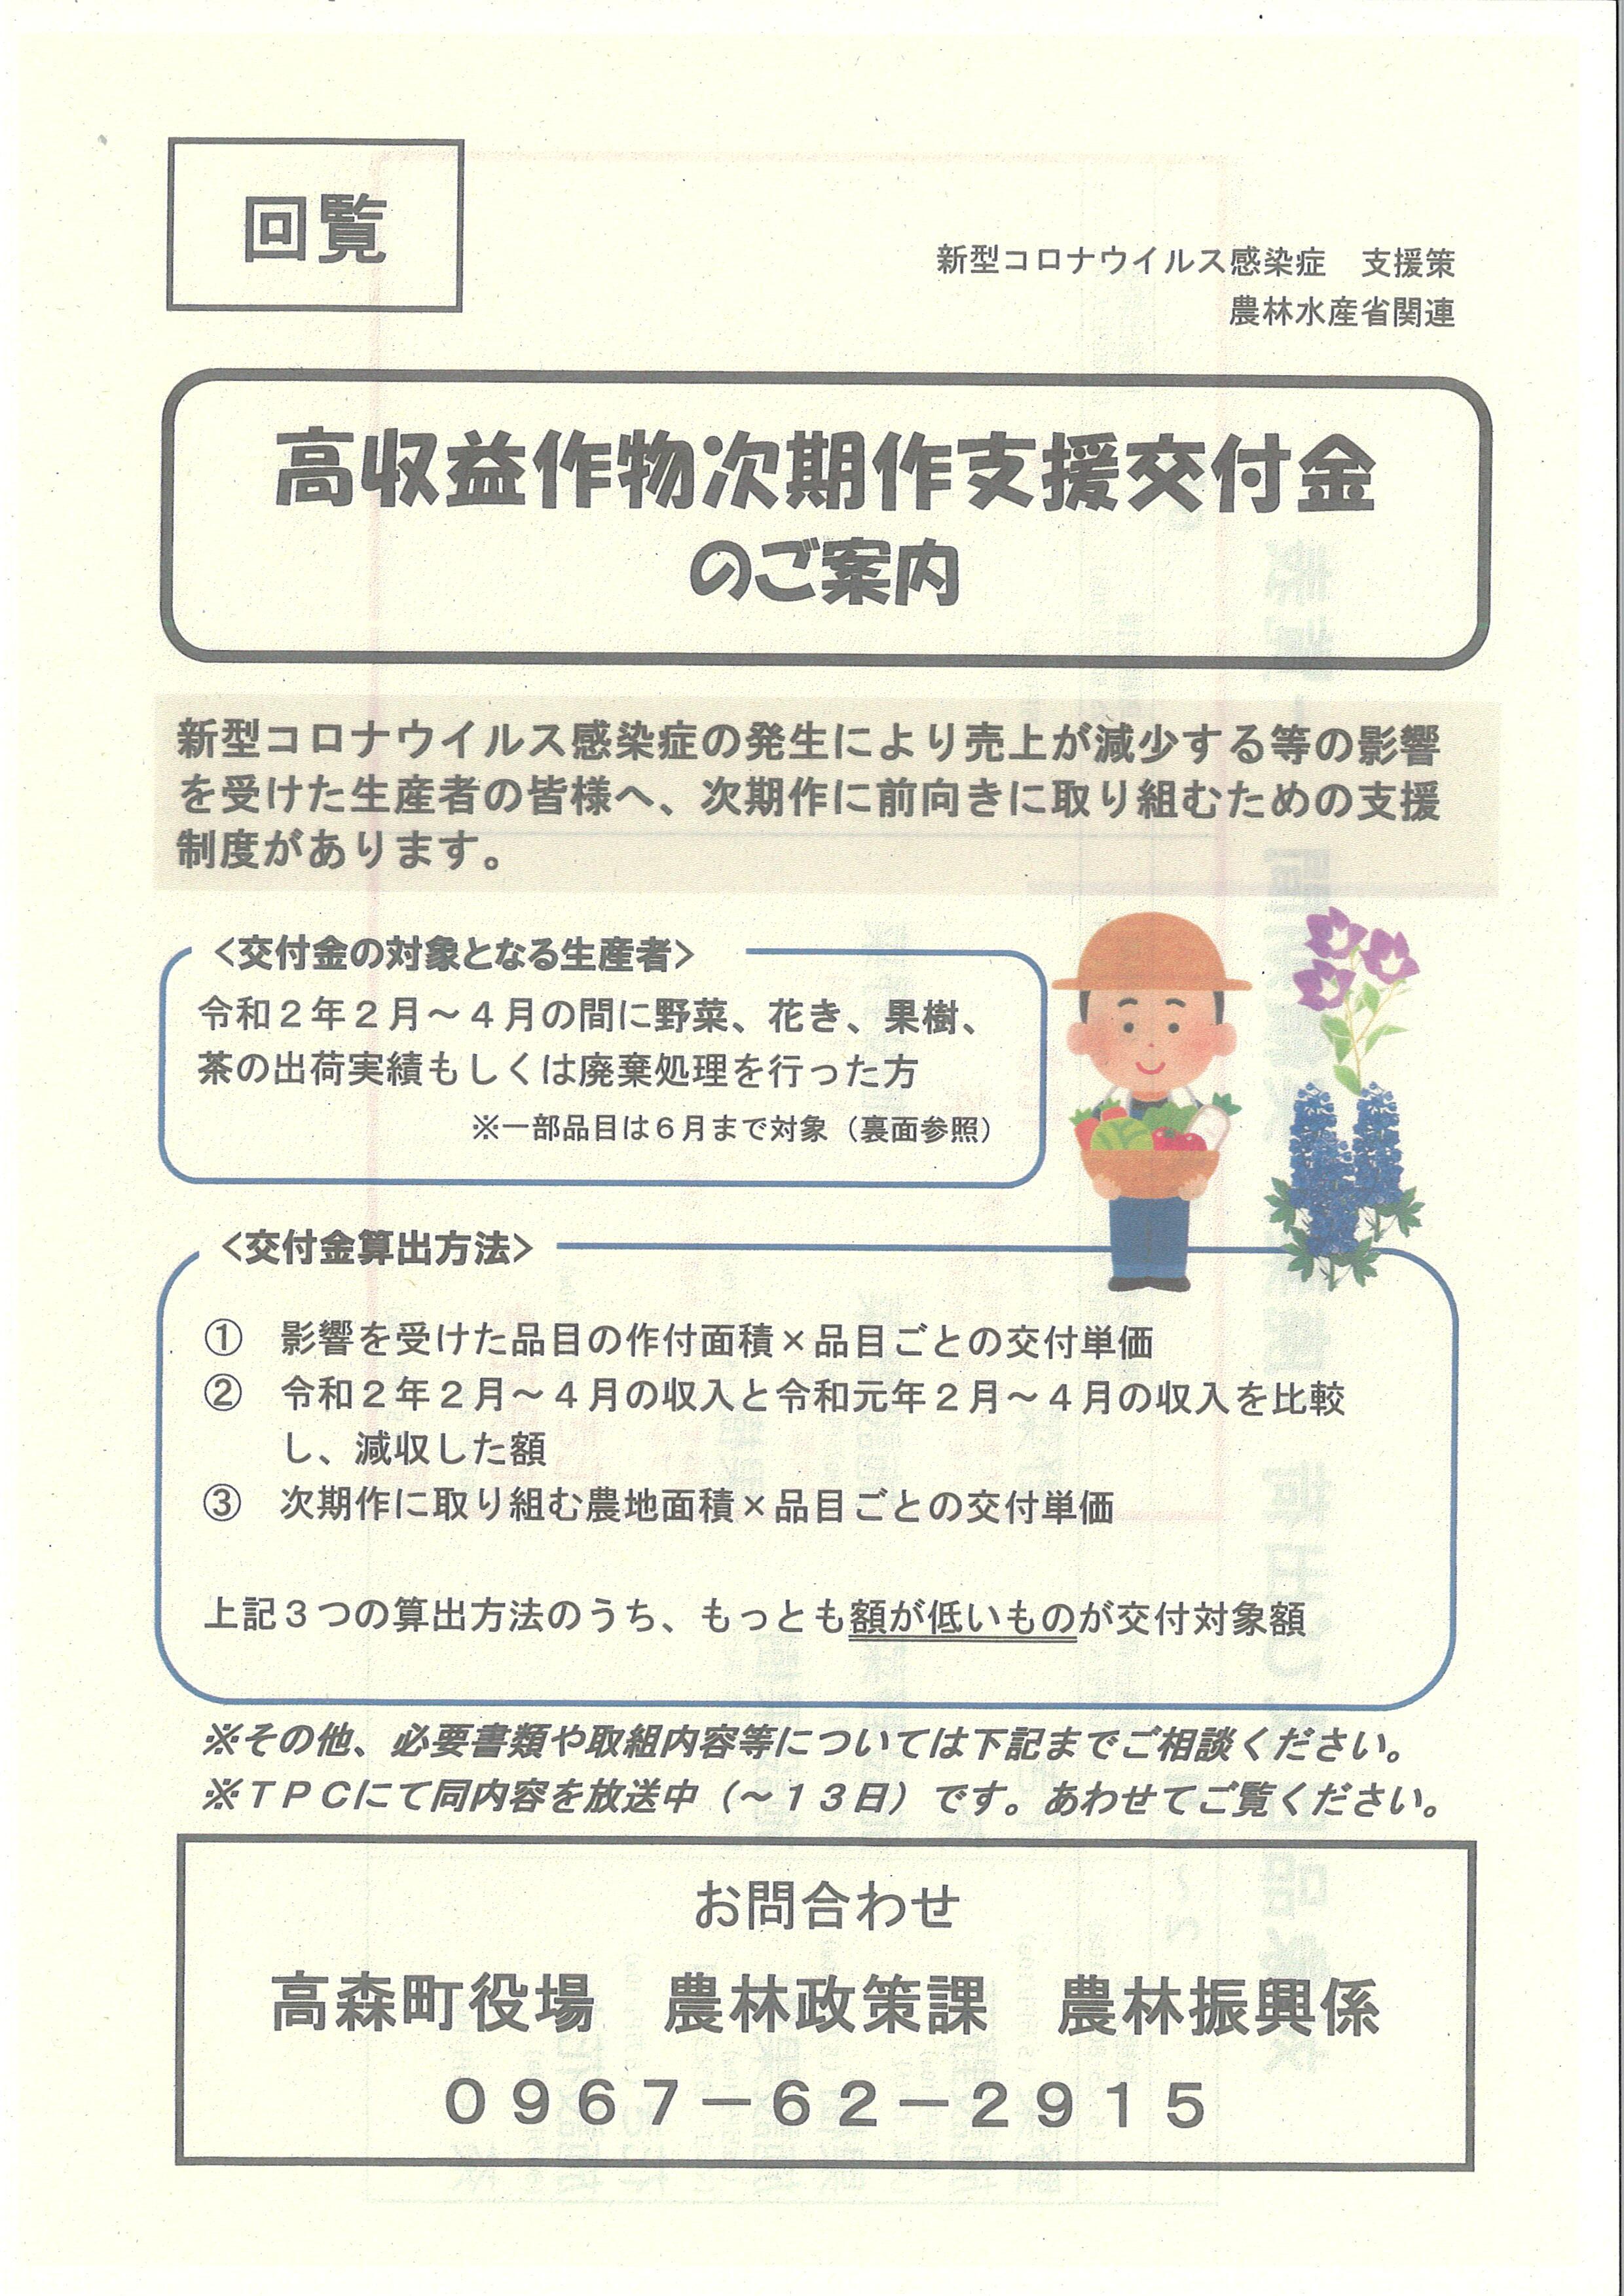 http://www.town.takamori.kumamoto.jp/chosha/somu/upload/17ff33ff92378dbee5c40d13742ccf3cbe7ae7ff.jpg